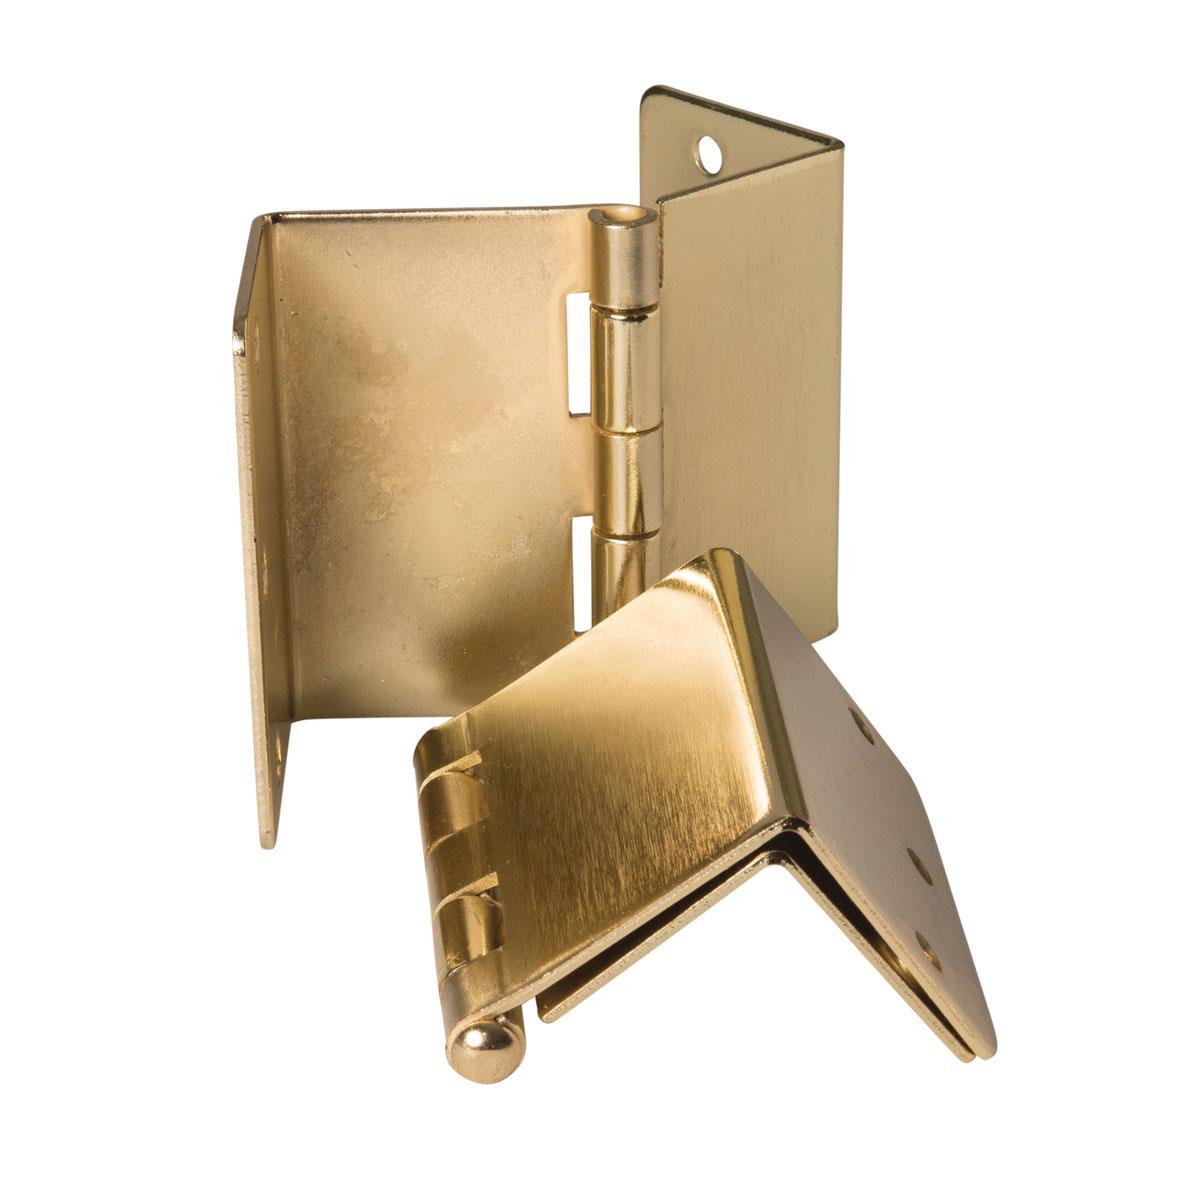 Expandable Door Hinge - Gold